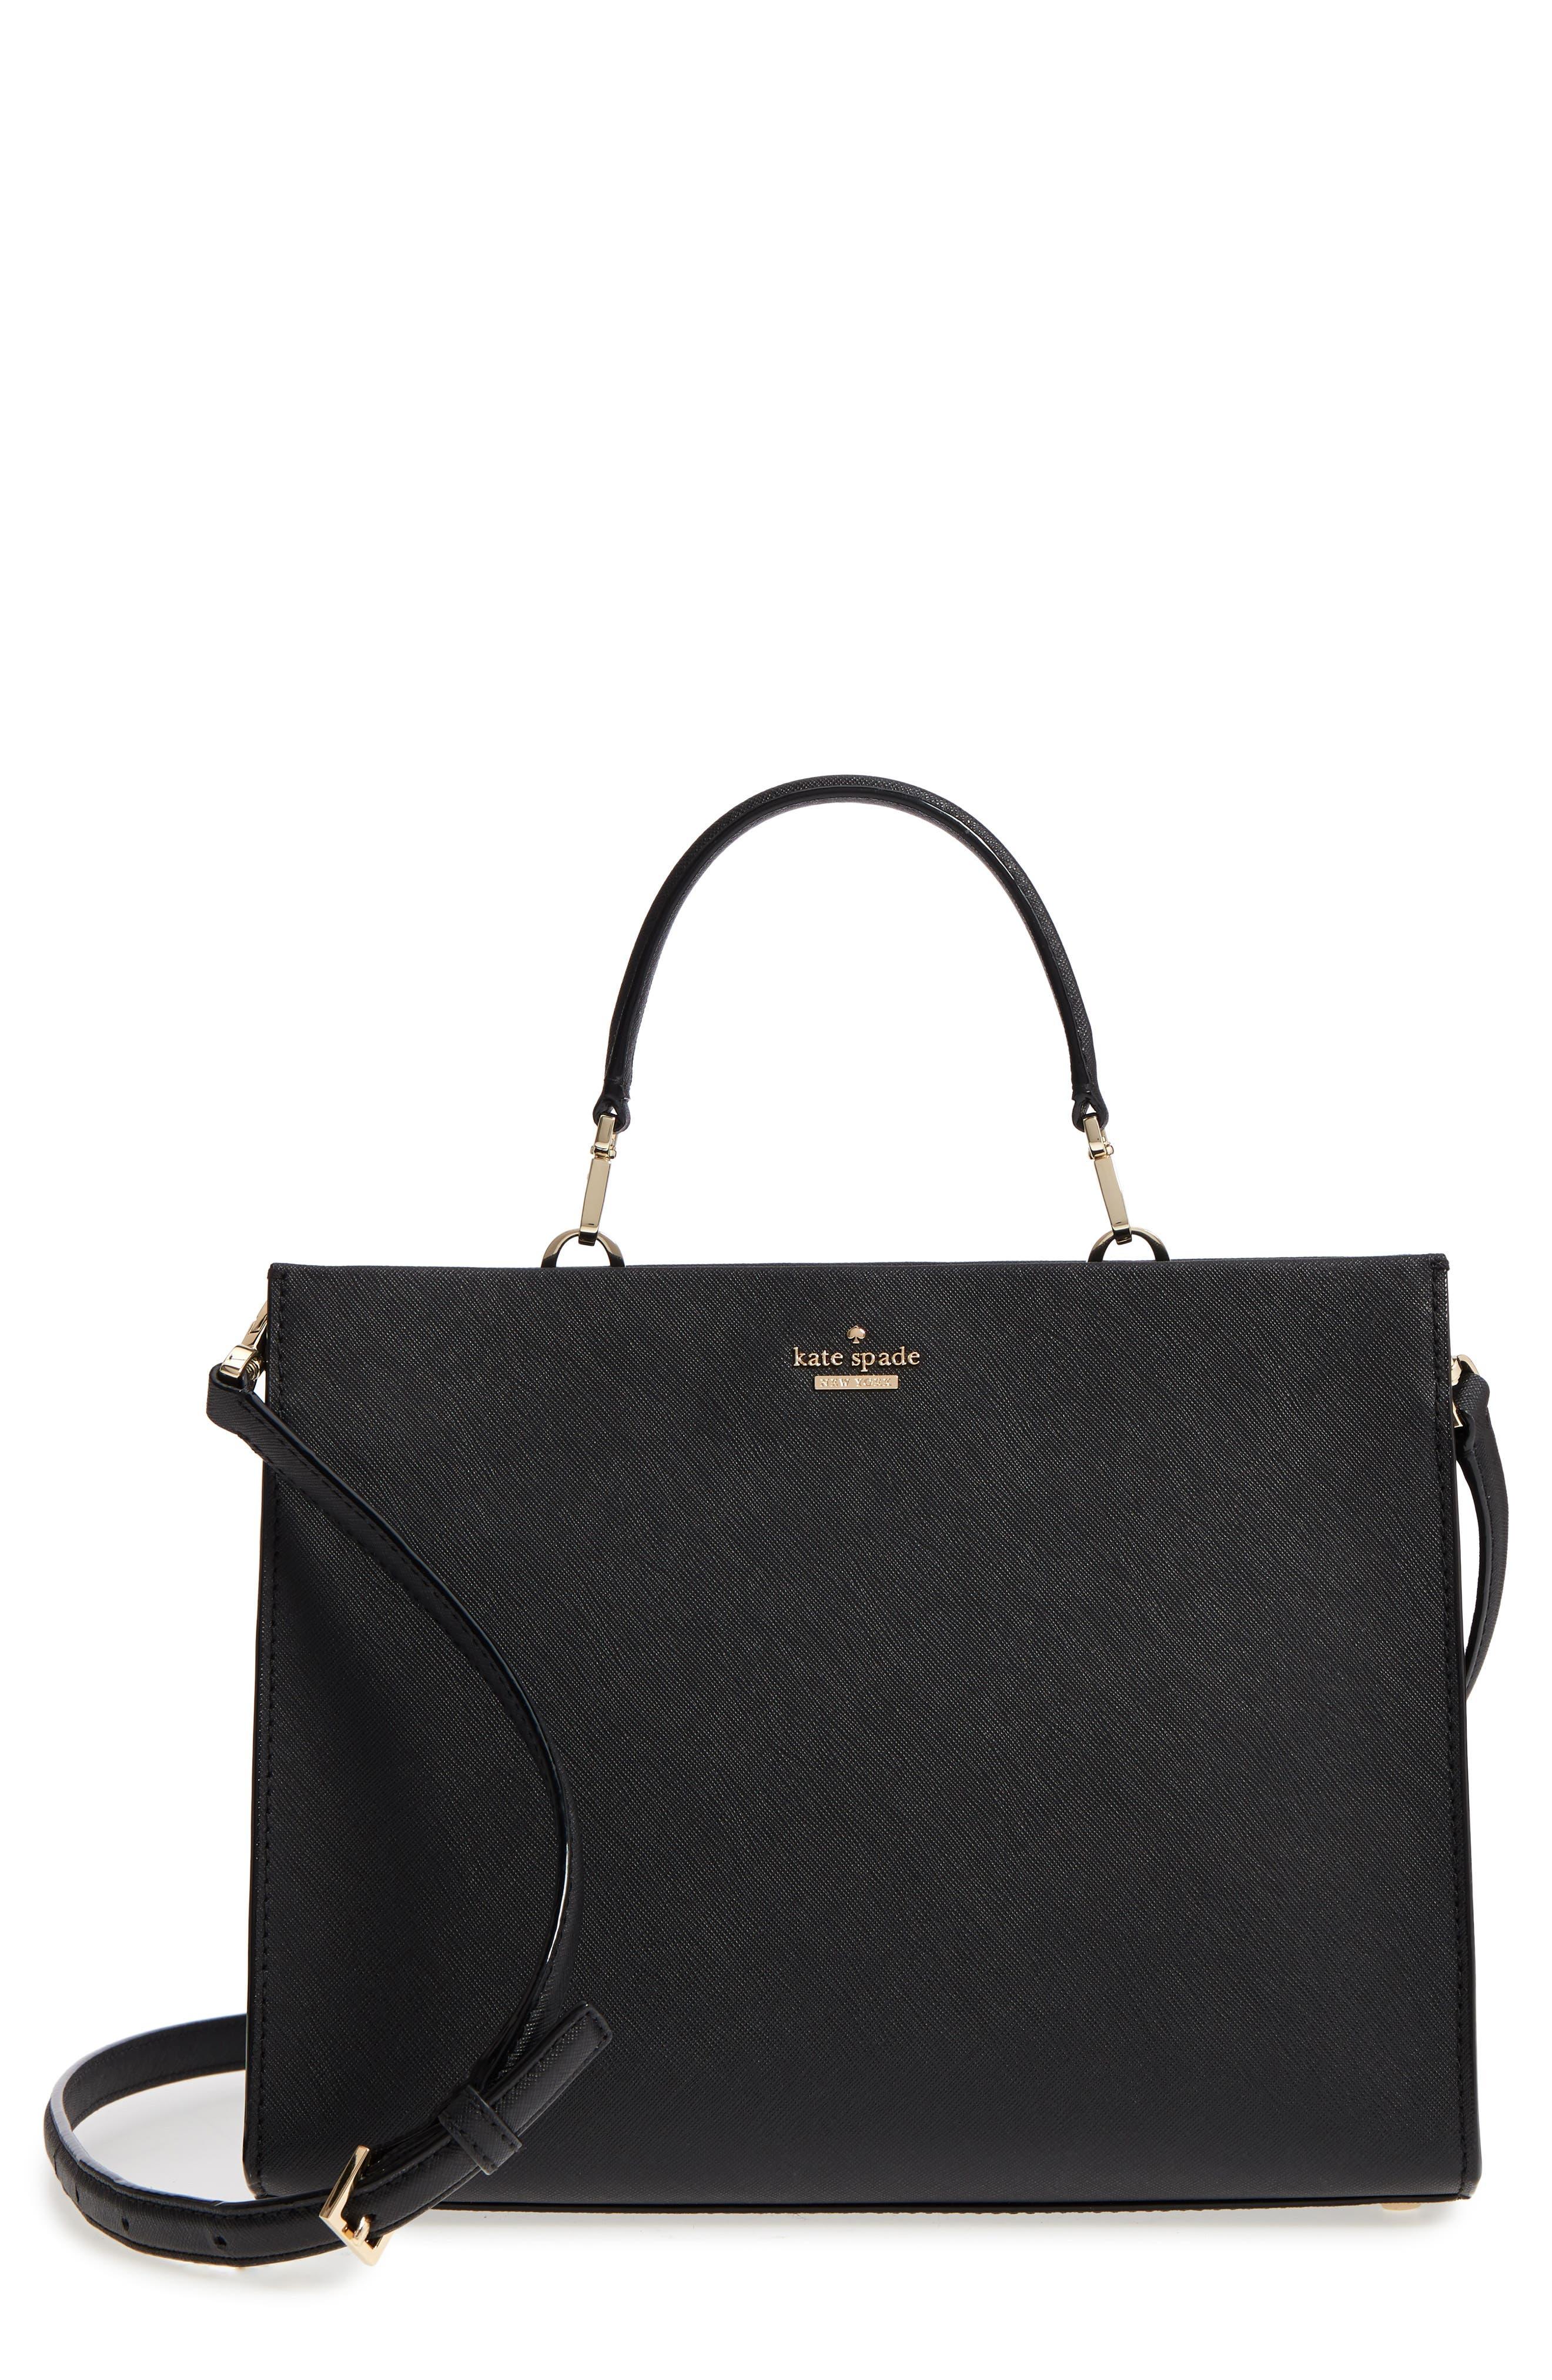 cameron street - sara leather satchel,                             Main thumbnail 1, color,                             001